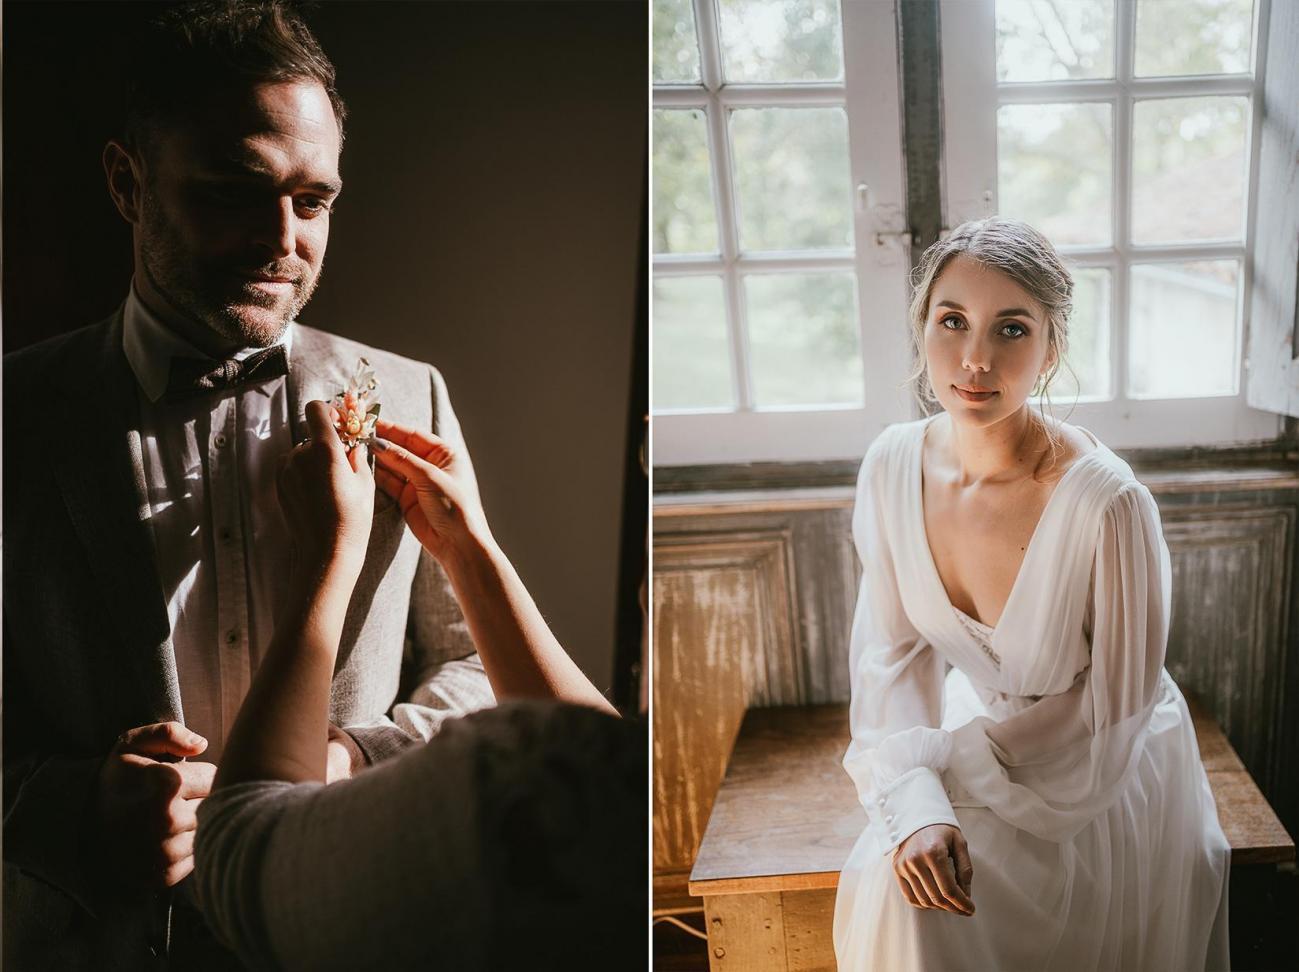 Mariage landes photographe inspiration elopement rustique wedding 77